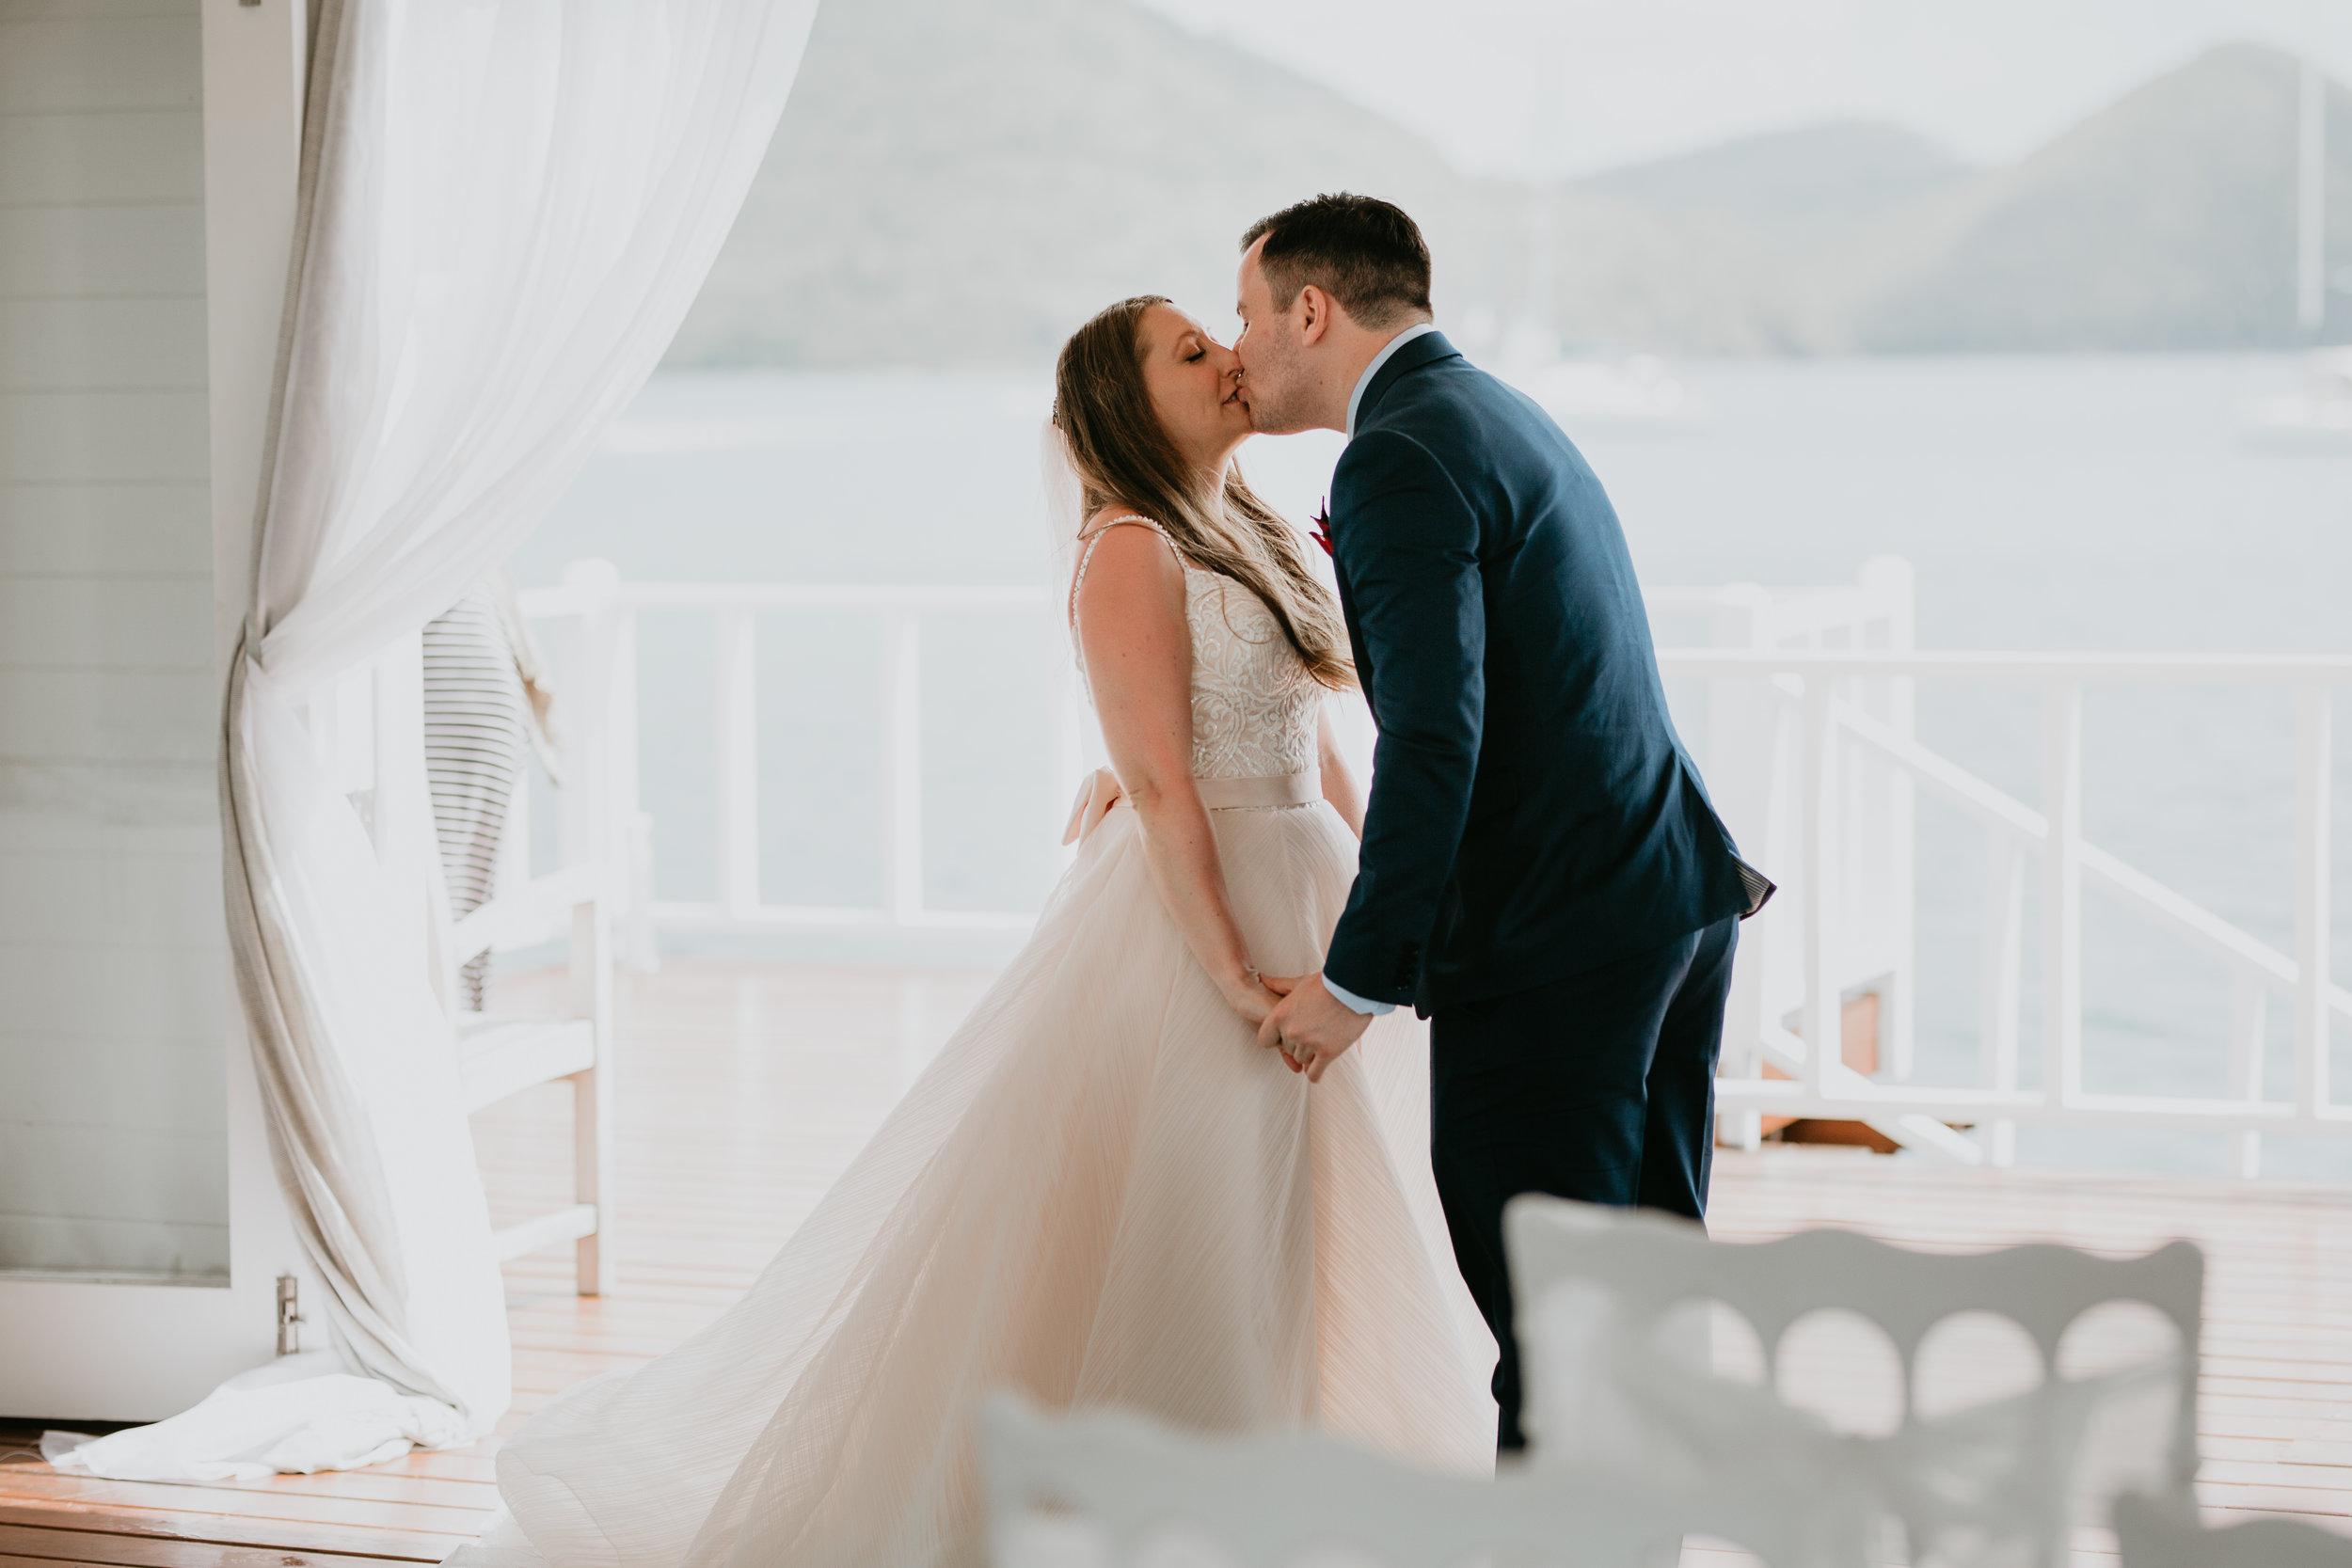 nicole-daacke-photography-destination-wedding-in-st-lucia-sandals-la-toc-intimate-island-wedding-carribean-elopement-photographer-chill-island-wedding-37.jpg